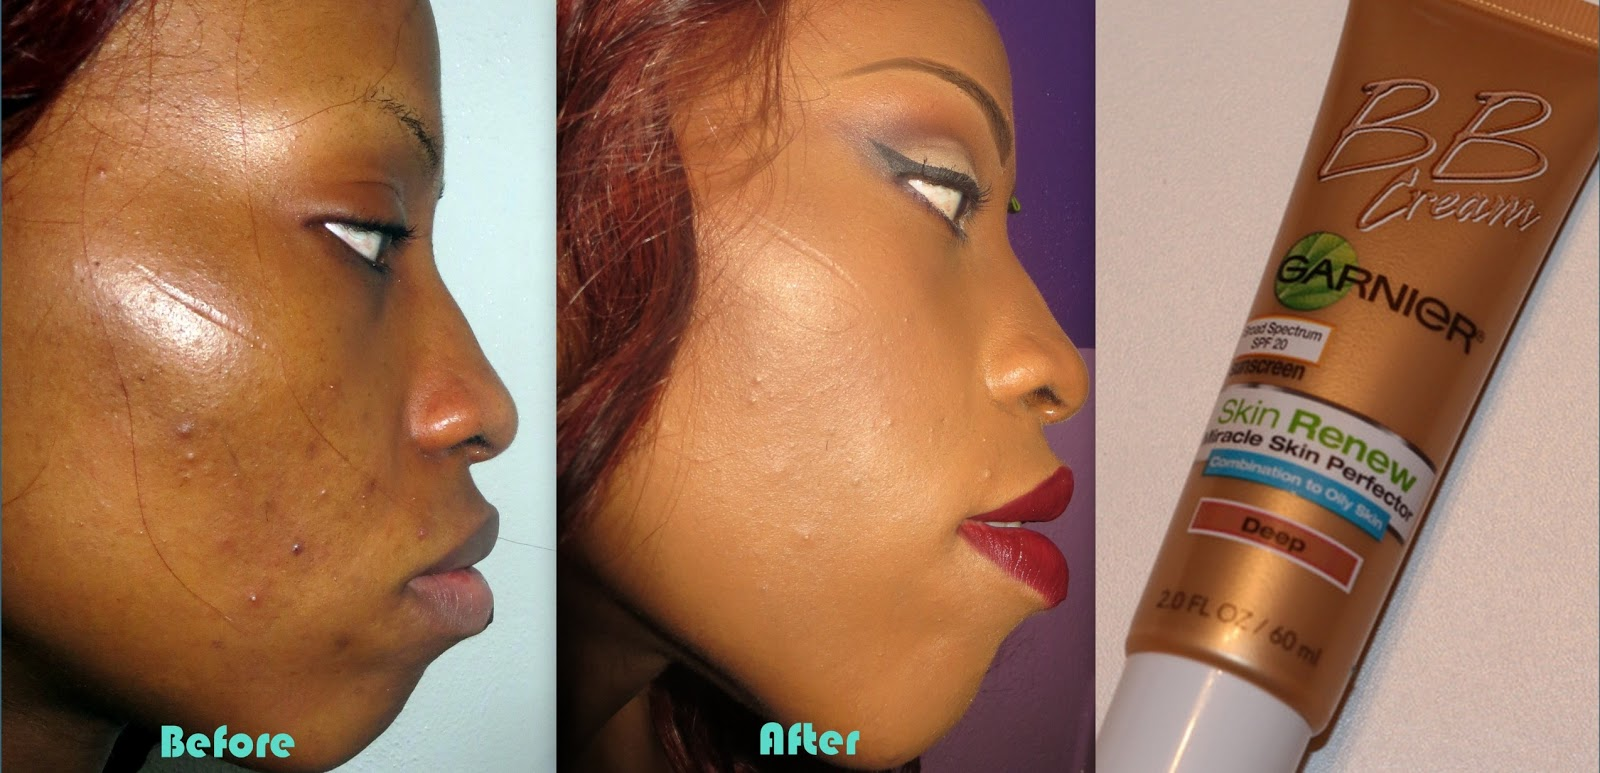 BB Cream 5-in-1 Miracle Skin Perfector  by garnier #19